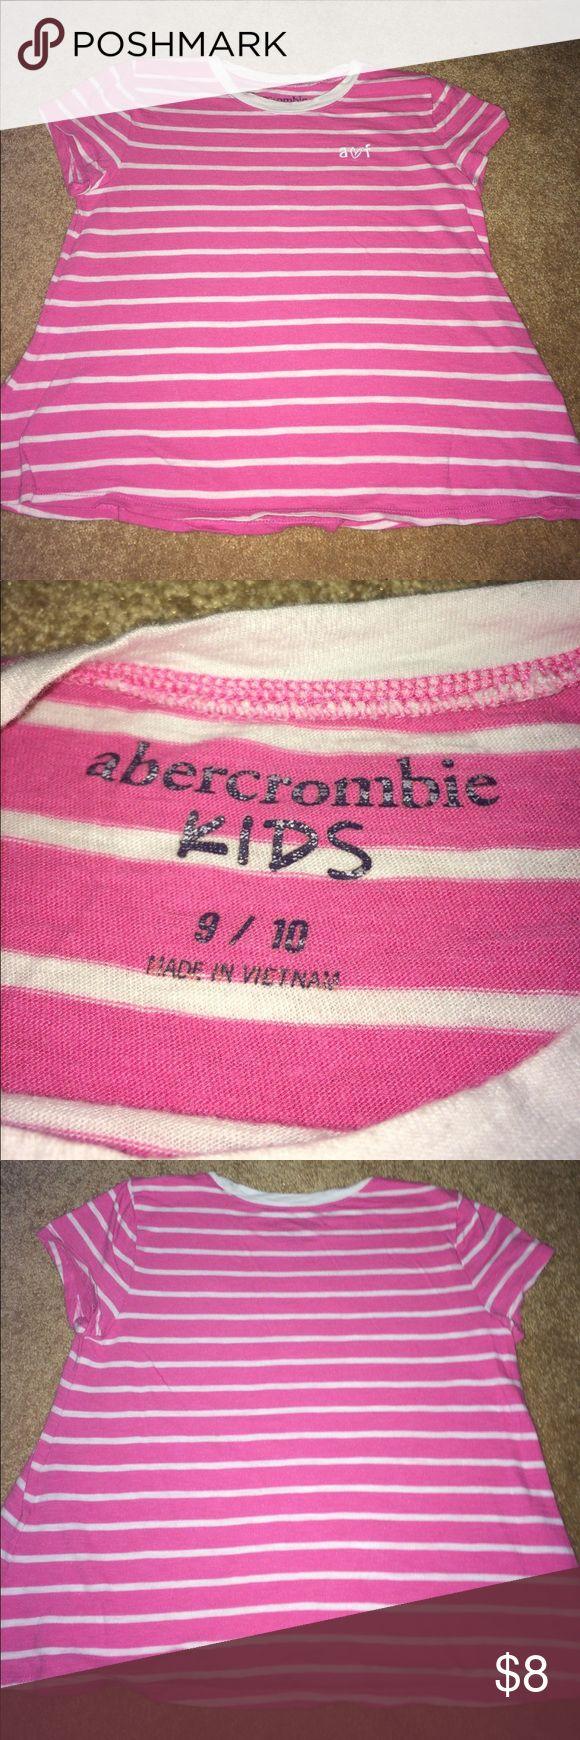 Pink striped Abercrombie girls shirt Size: 9/10 Abercombie Kids Shirts & Tops Tees - Short Sleeve